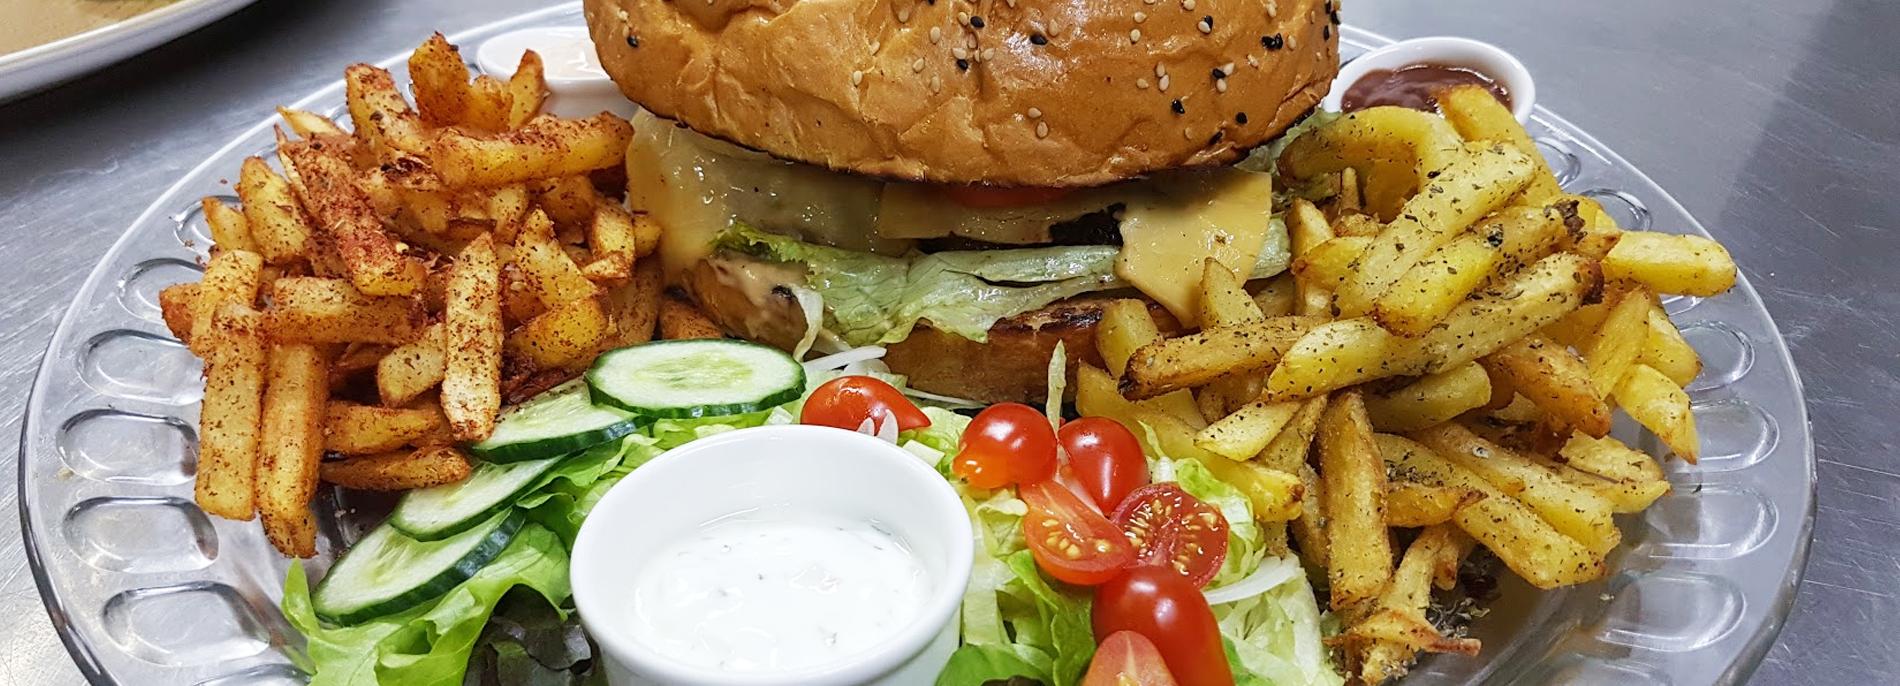 021-Burger-Dubai